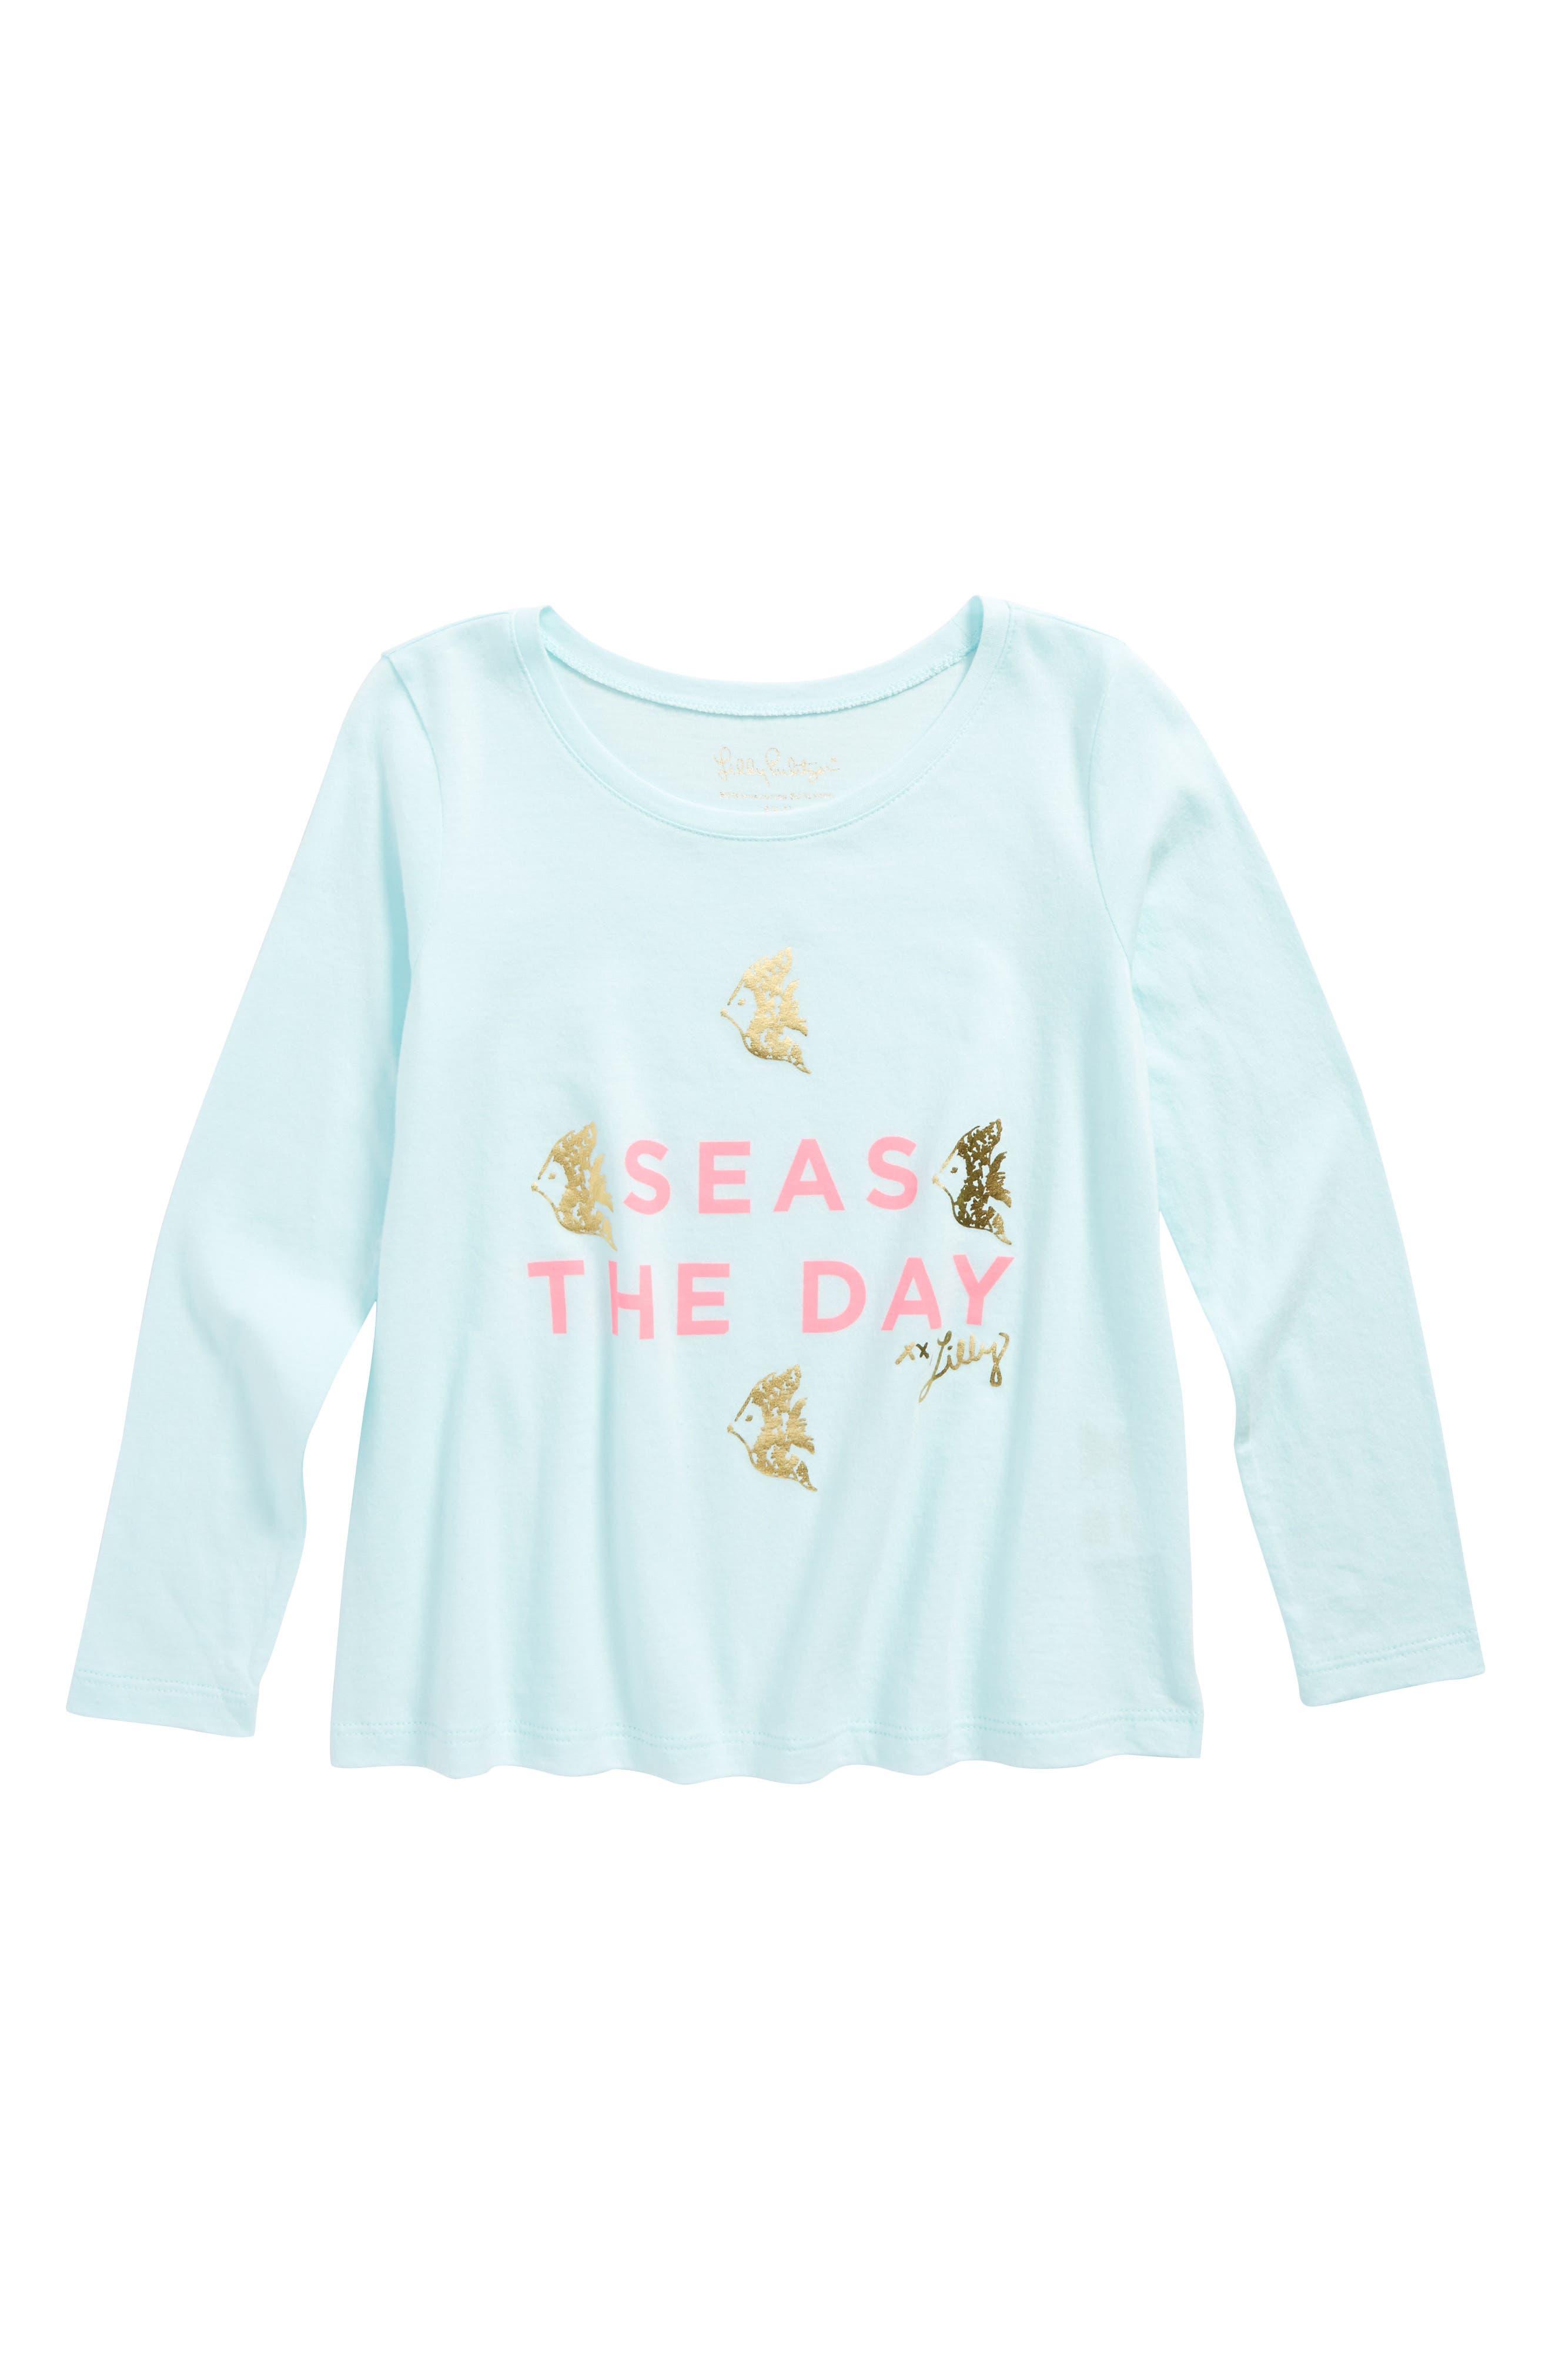 Alternate Image 1 Selected - Lilly Pulitzer® Kay Graphic Tee (Toddler Girls, Little Girls & Big Girls)